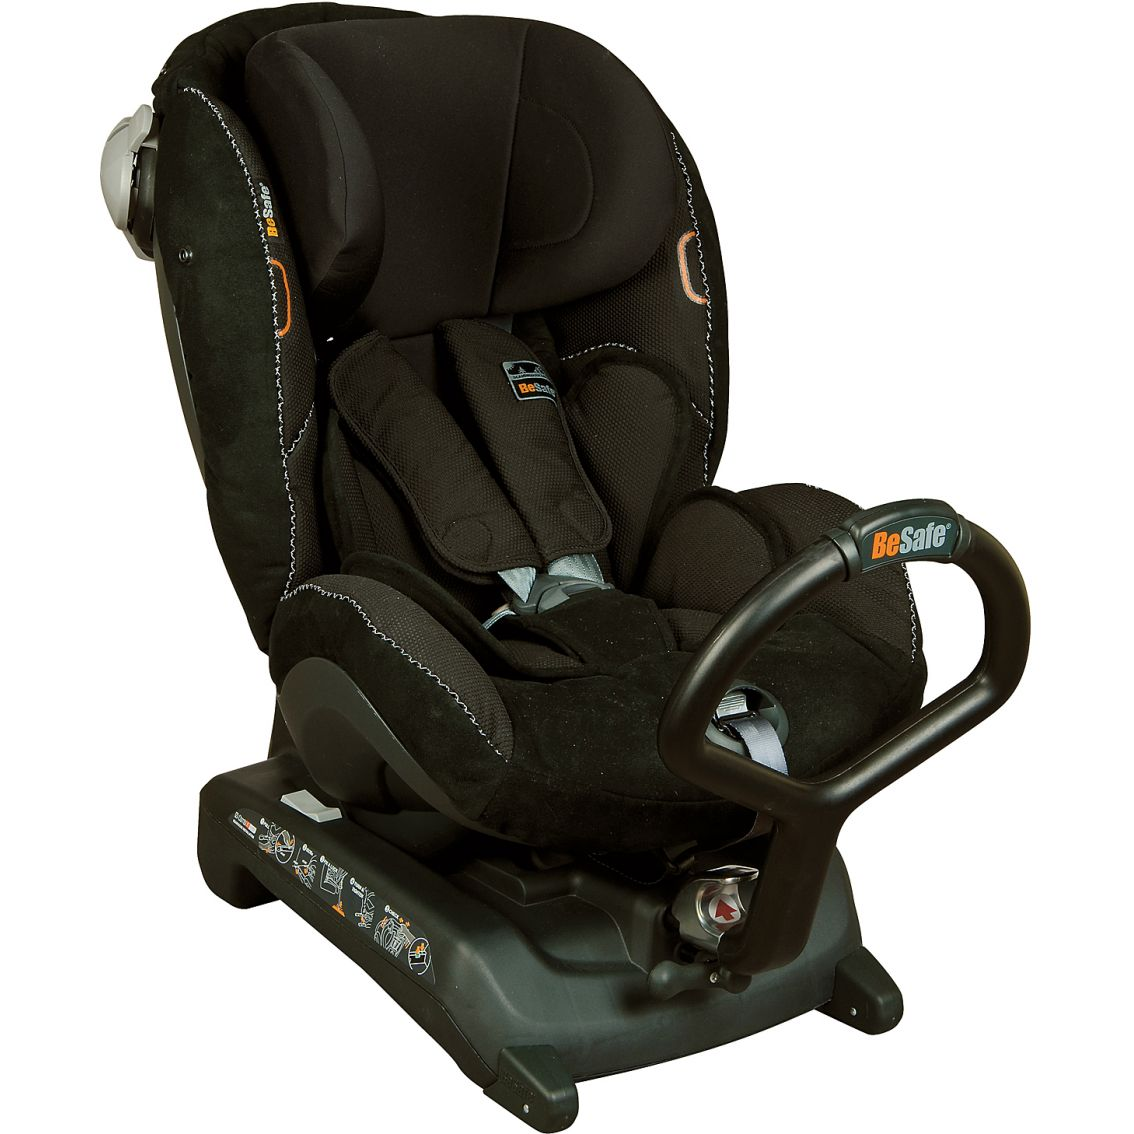 besafe izi combi isofix car seat. Black Bedroom Furniture Sets. Home Design Ideas